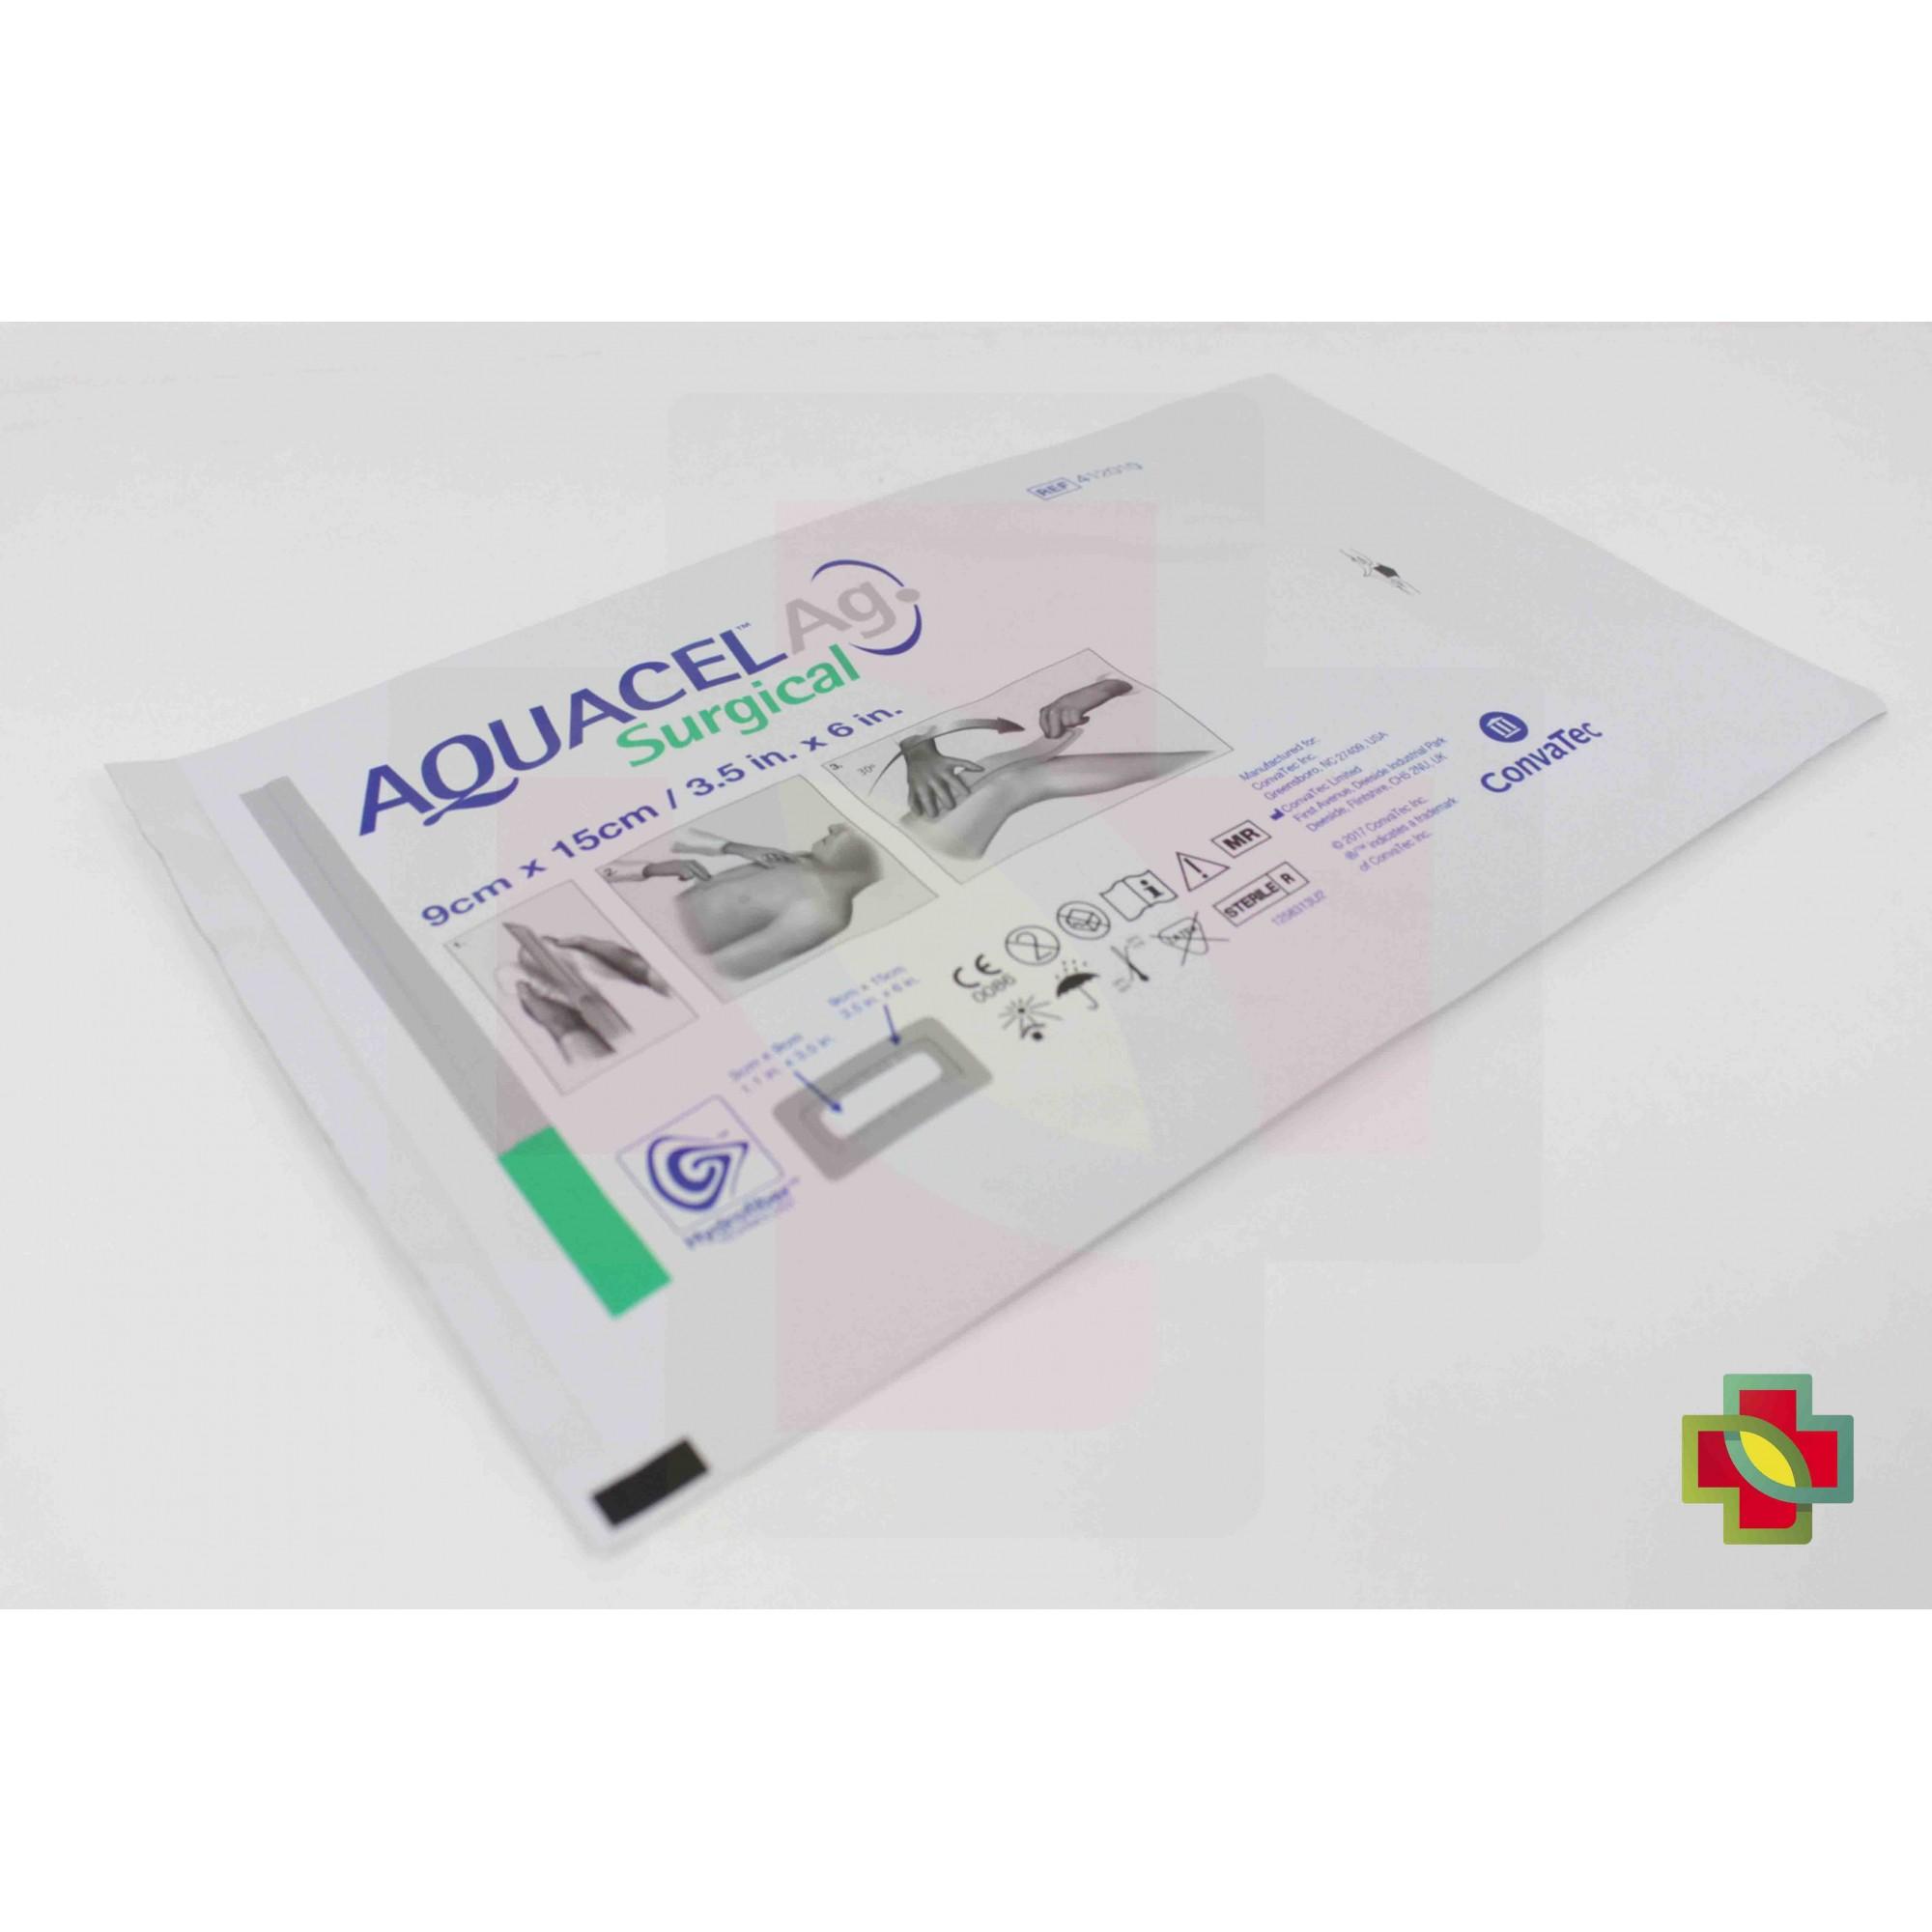 CURATIVO AQUACEL AG SURGICAL 09 X 15 UND. 412010 CONVATEC